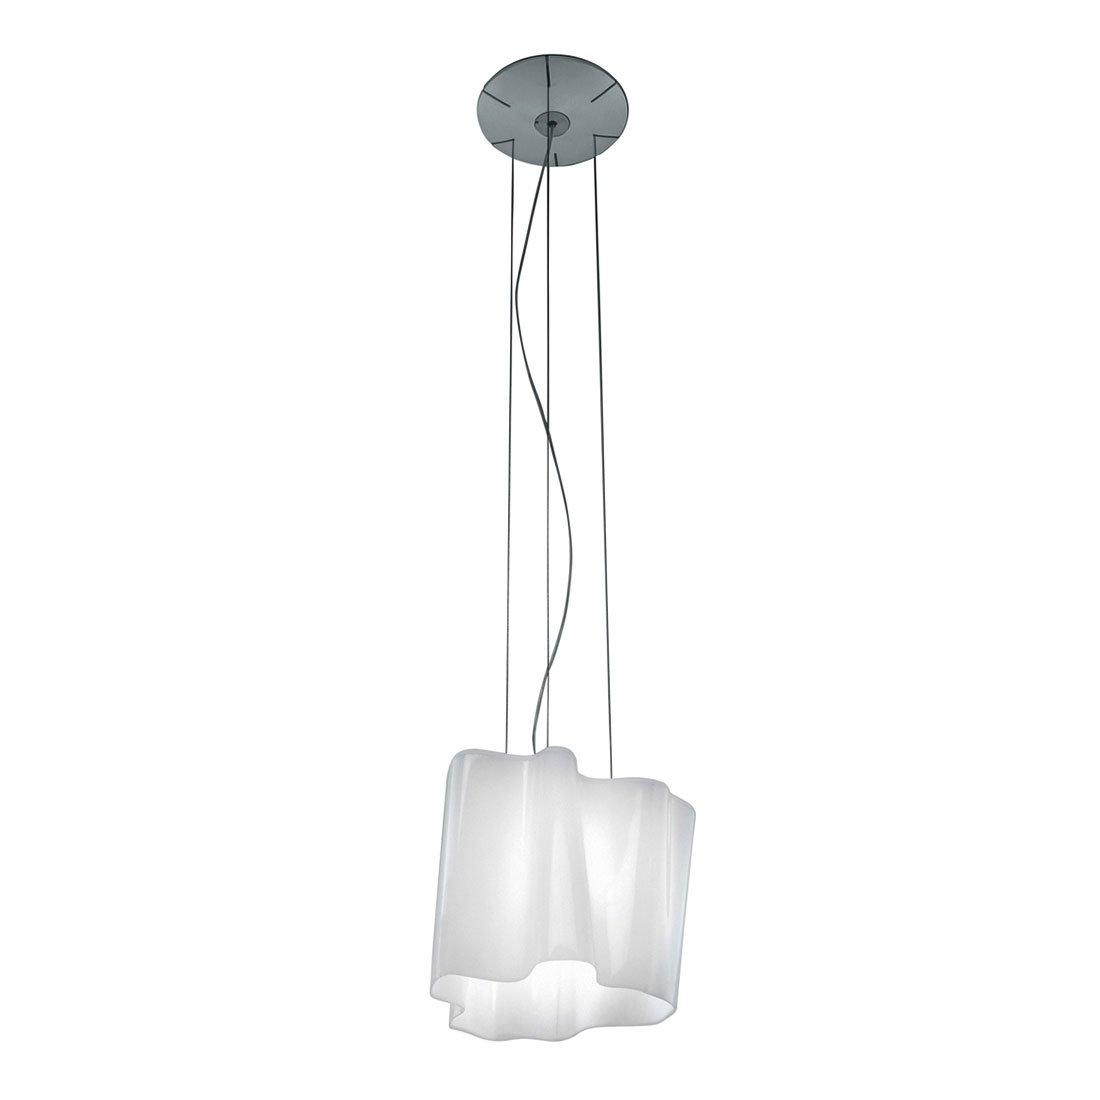 Artemide Logico Mini Single Hanglamp